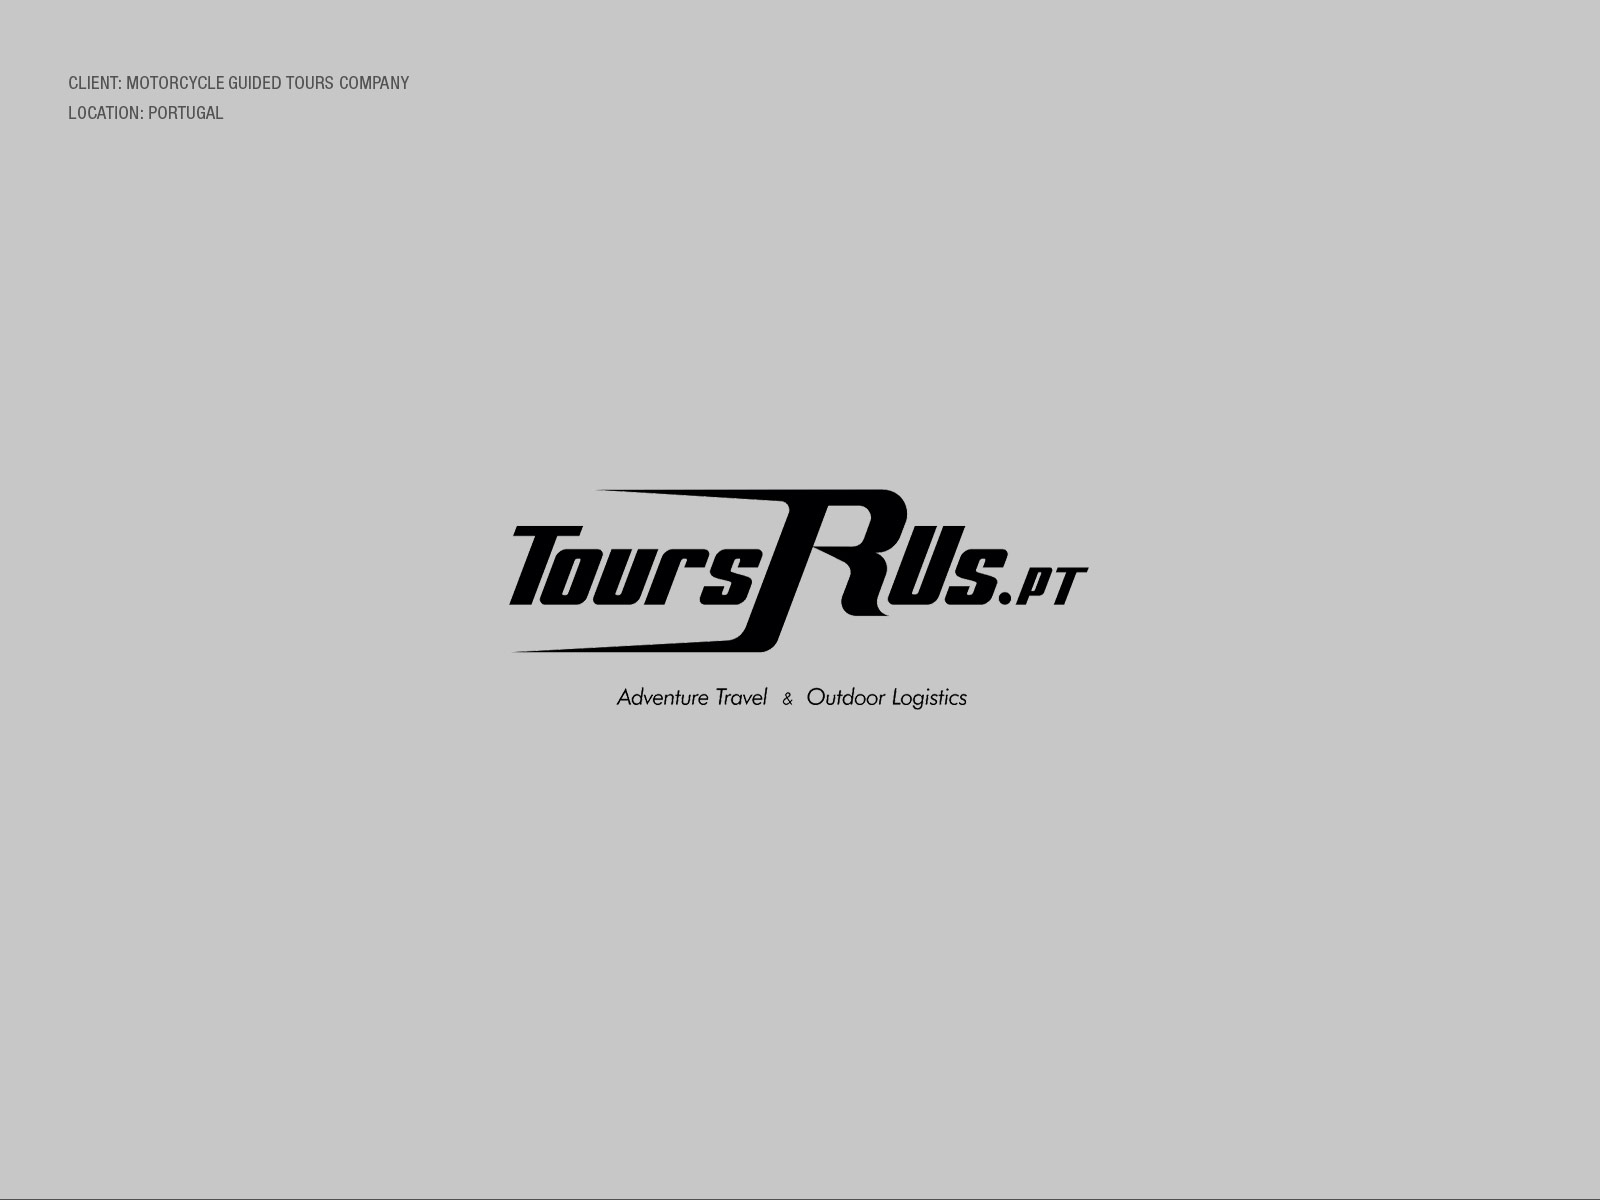 logodesign-toursrus